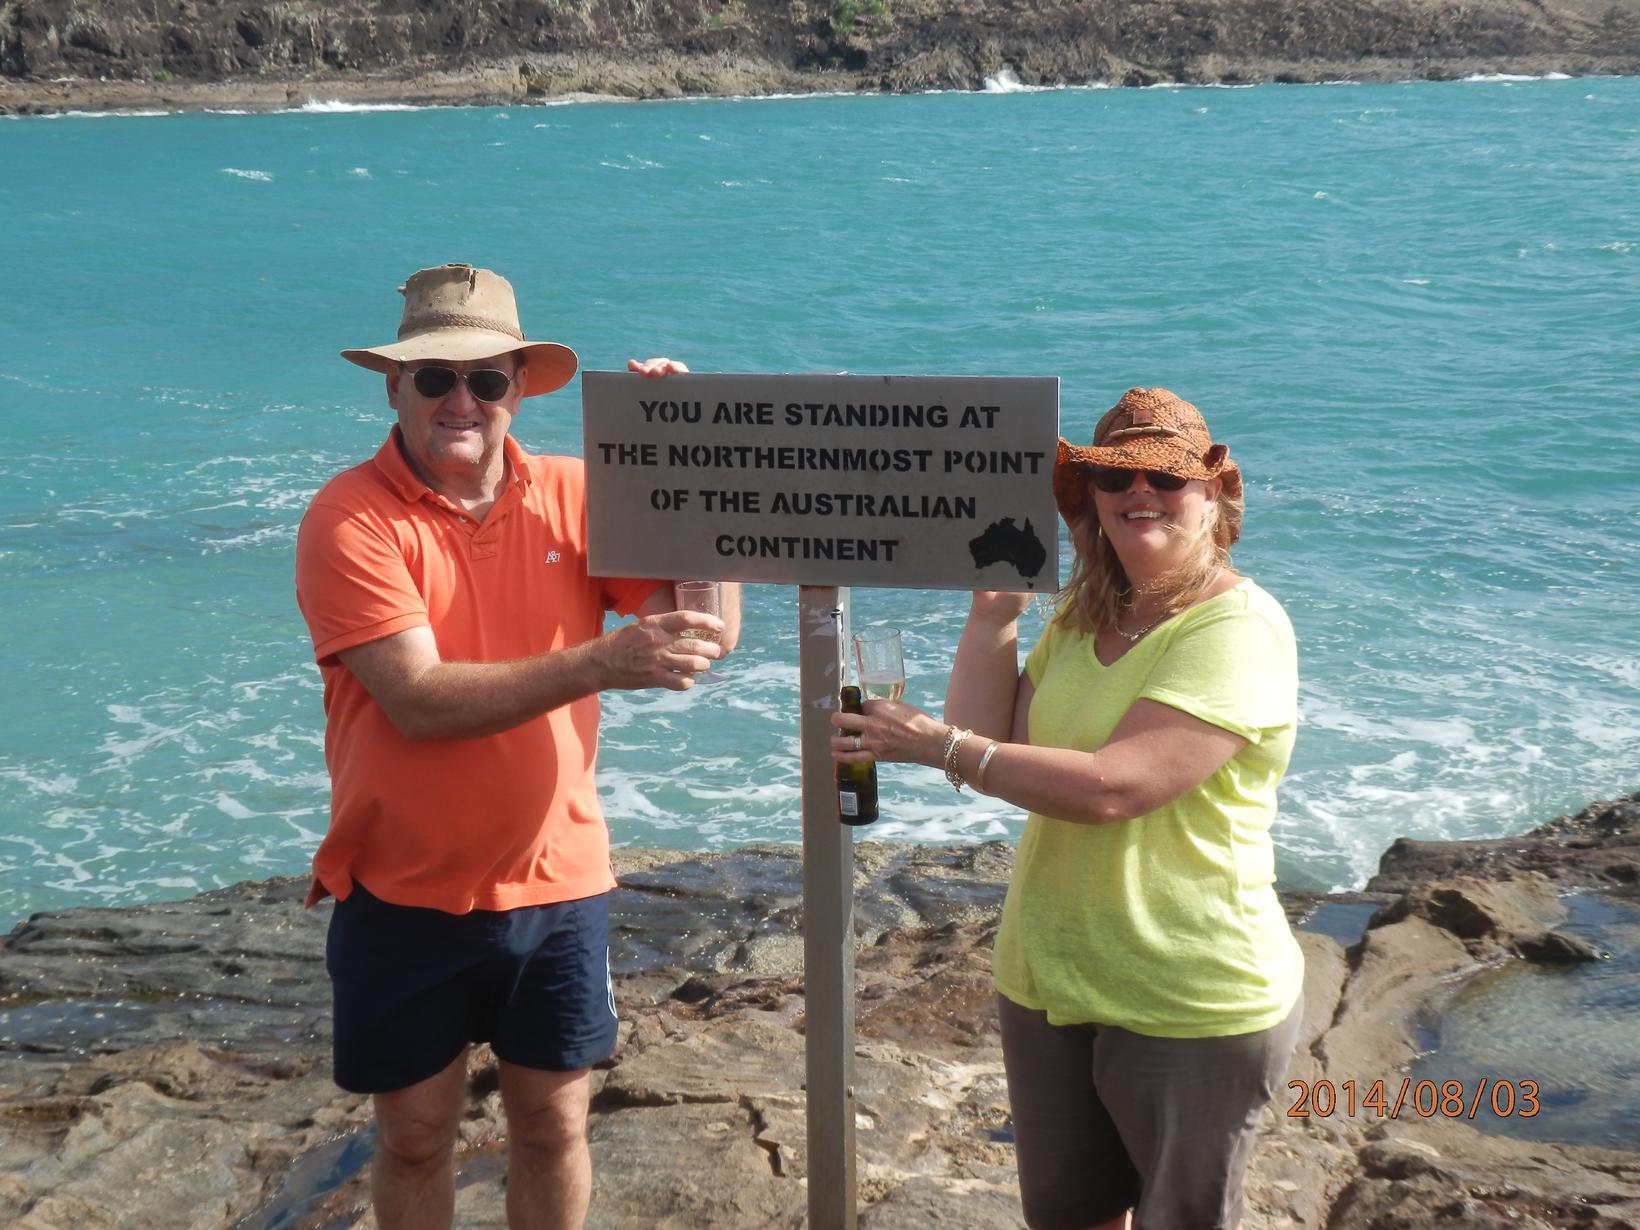 Kerri & Graham from Atherton, Queensland, Australia